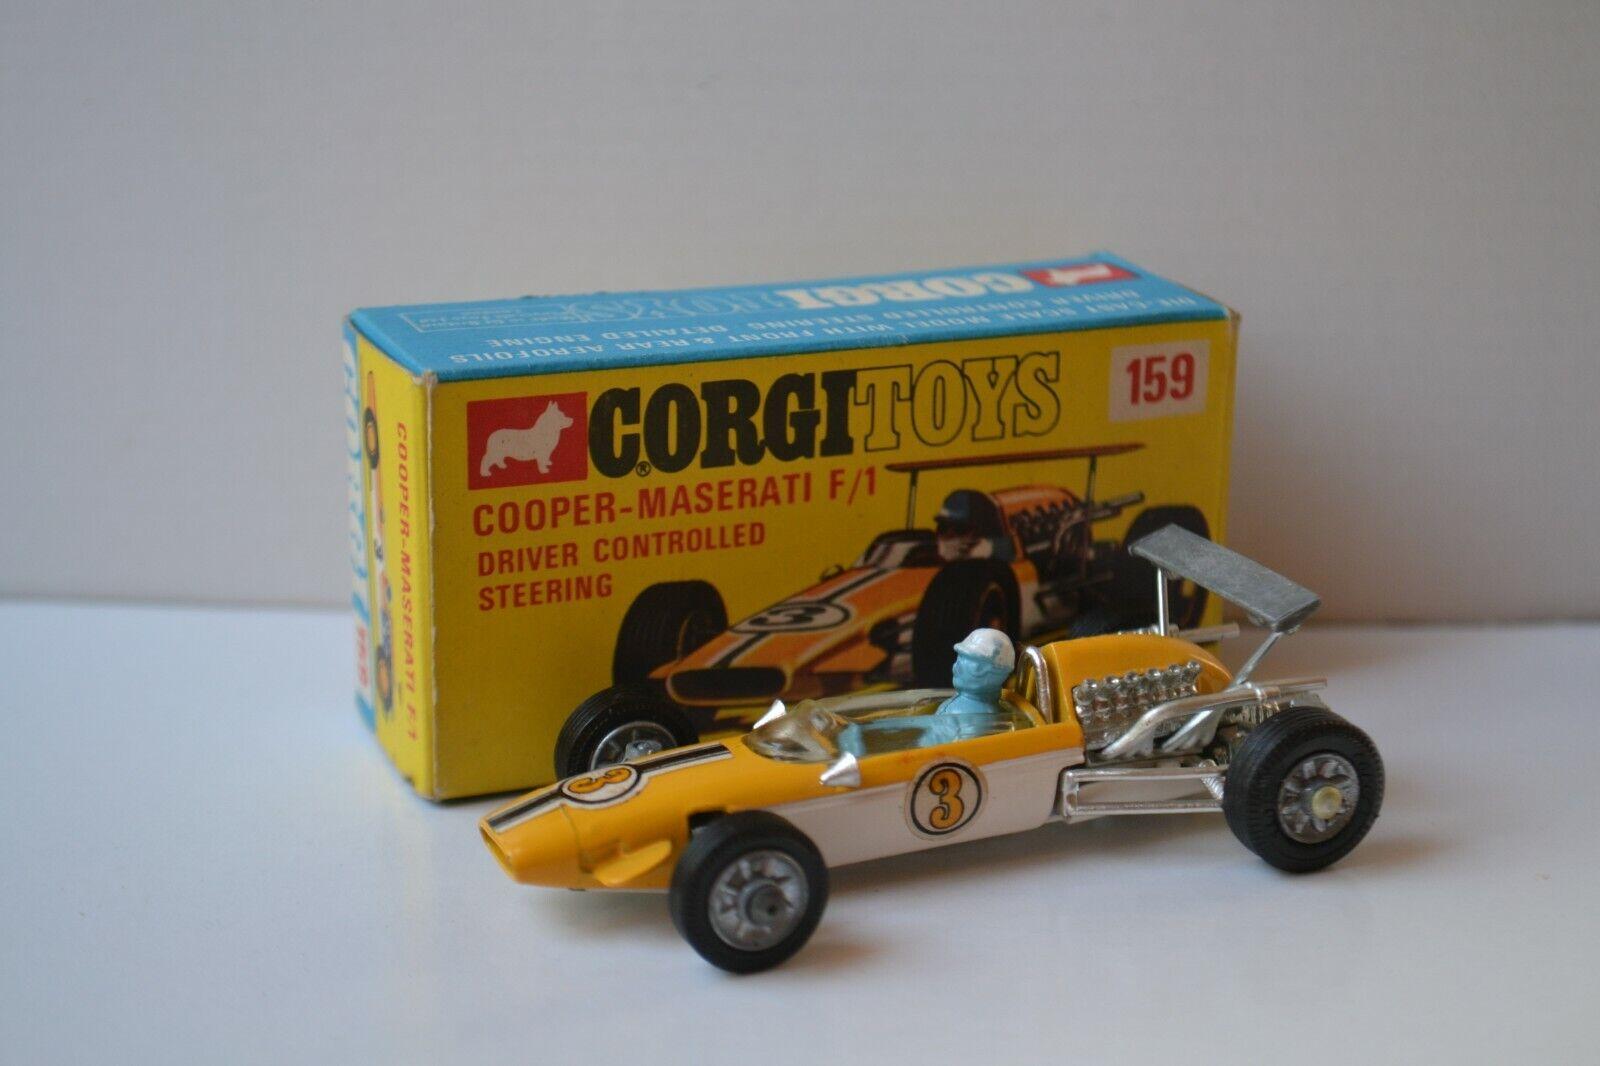 Corgi Toys 159 Cooper-Maserati F 1 OVP